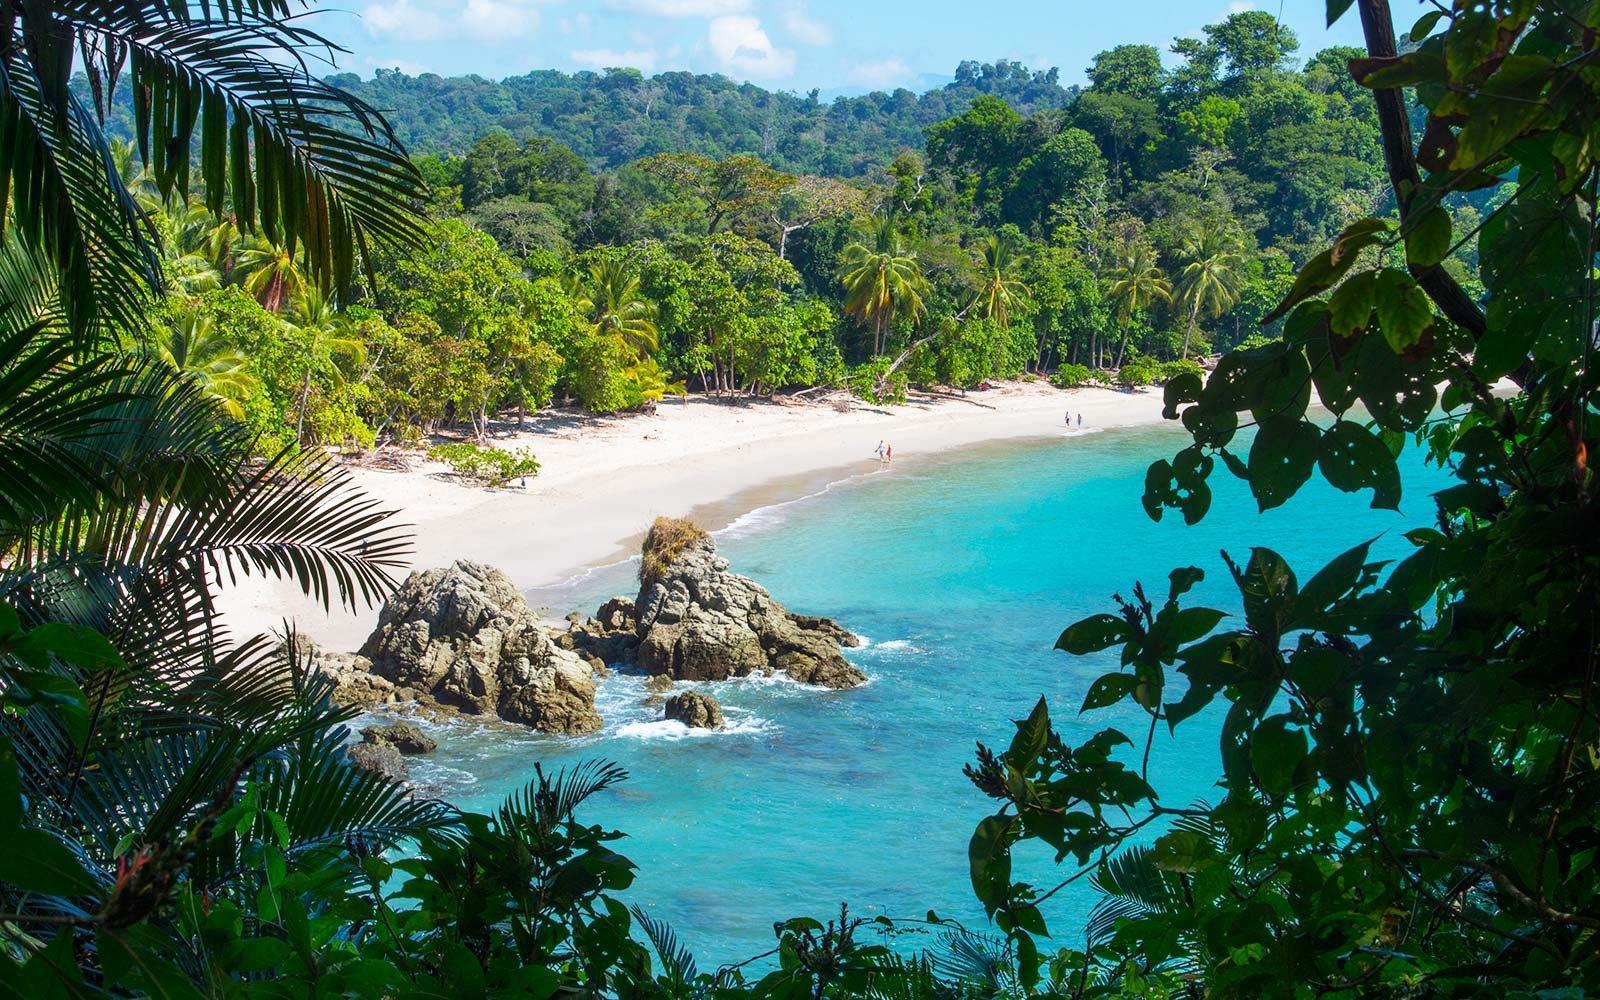 manuel-antonio-beach-costa-rica-CRFLIGHTDEAL1017